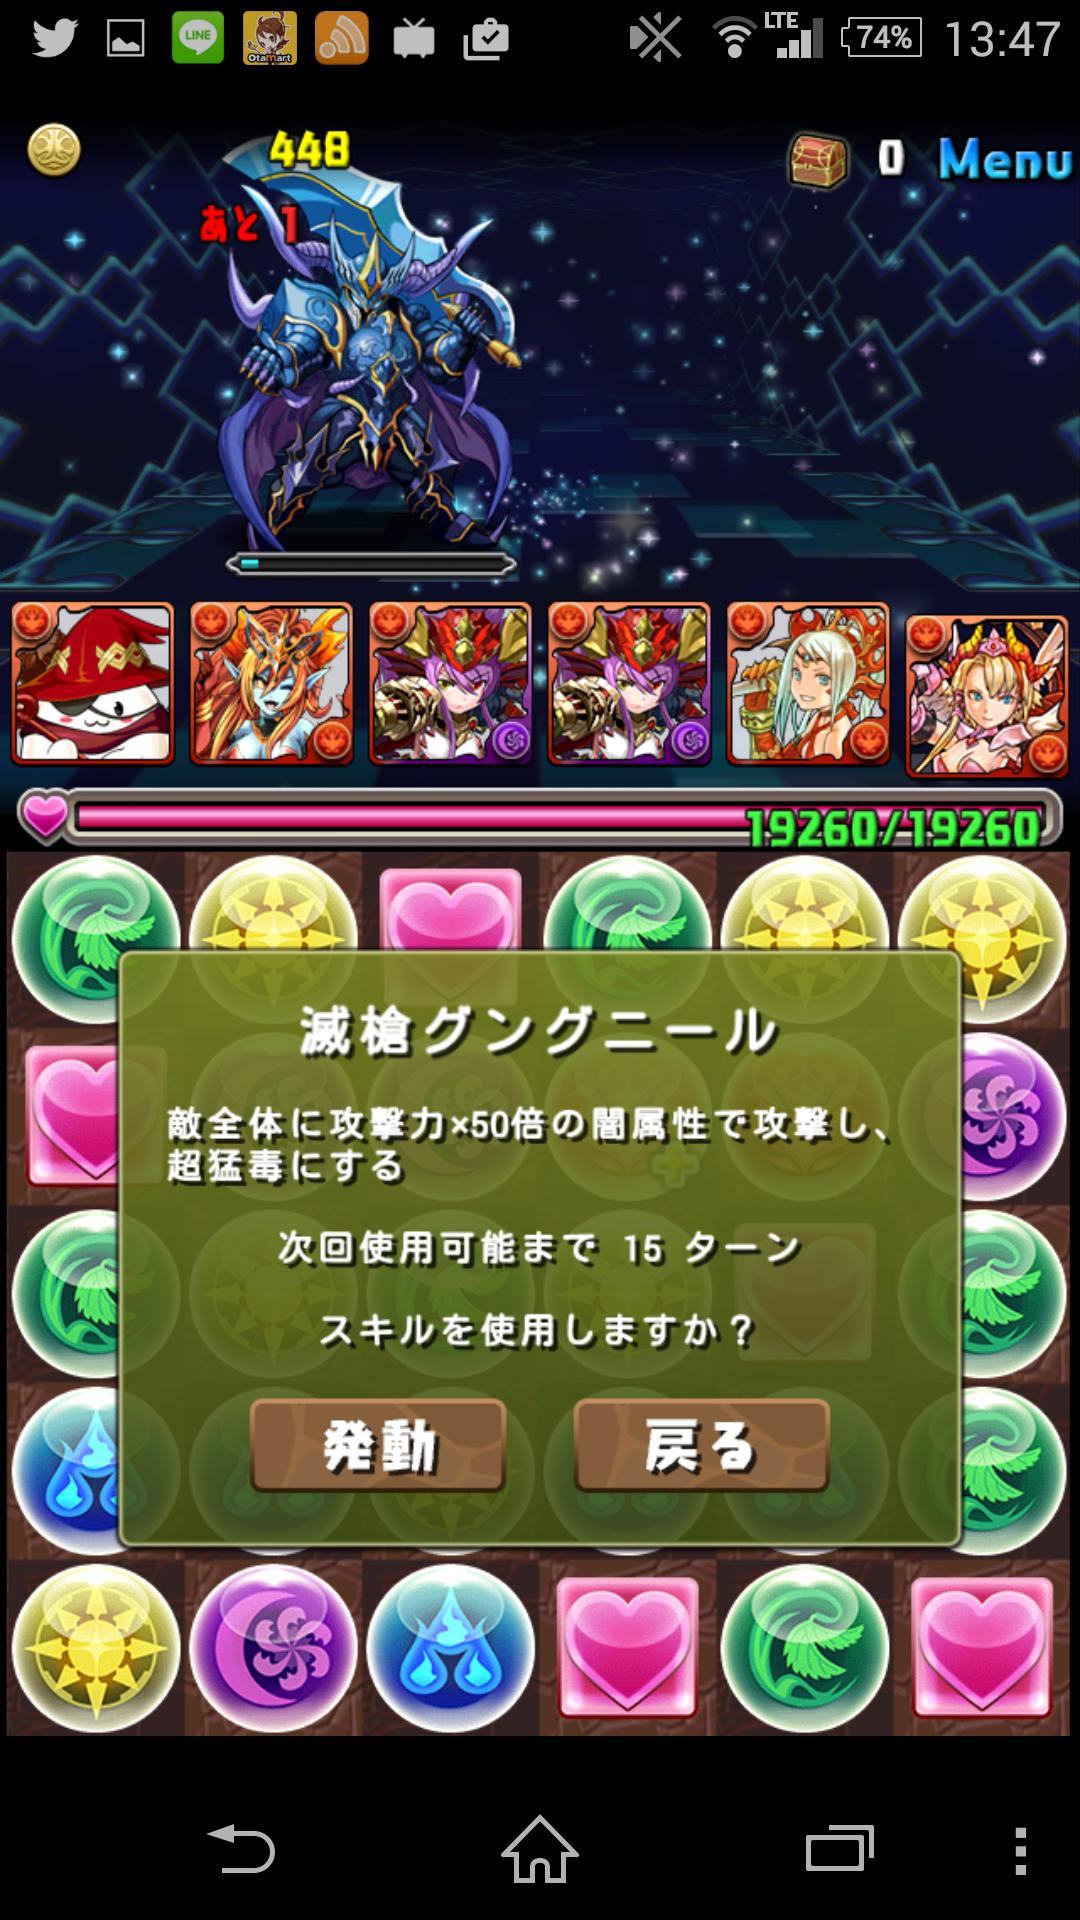 Screenshot_2015-02-18-13-47-42.png